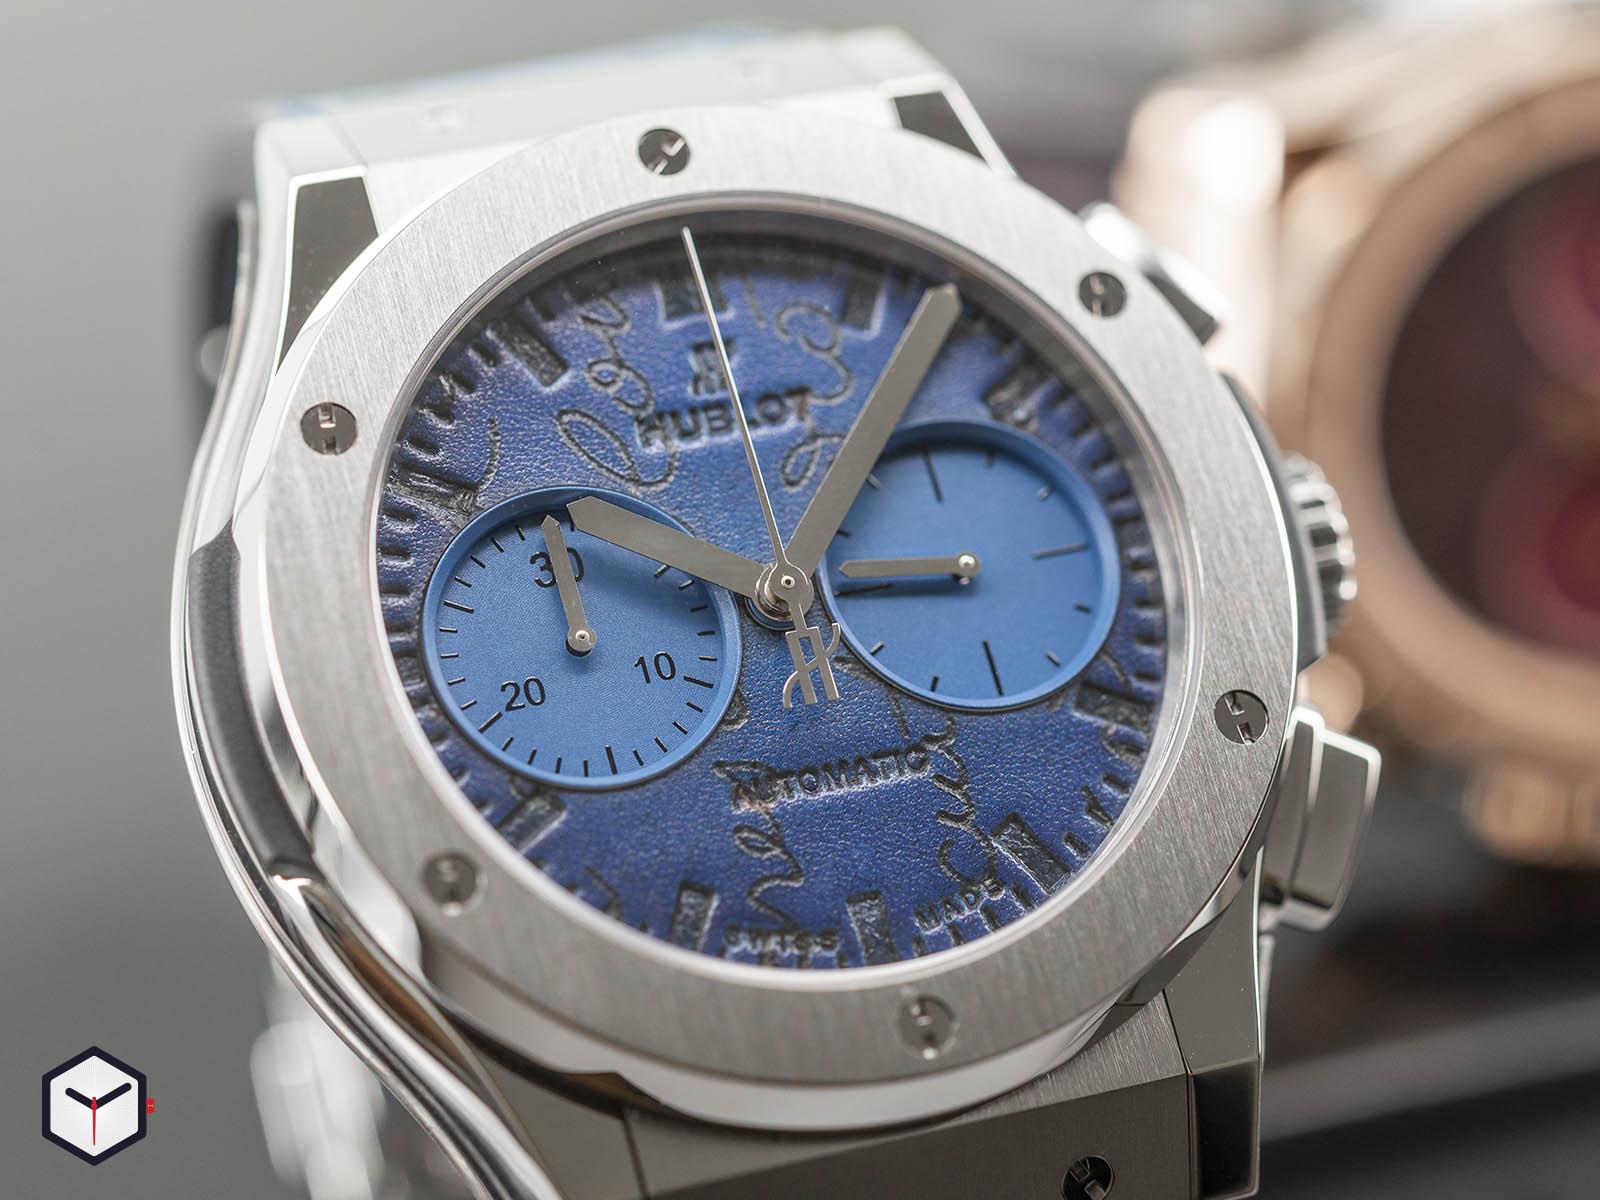 521-nx-050b-vr-ber18-hublot-classic-fusion-chronograph-berluti-scritto-ocean-blue-45mm-2.jpg